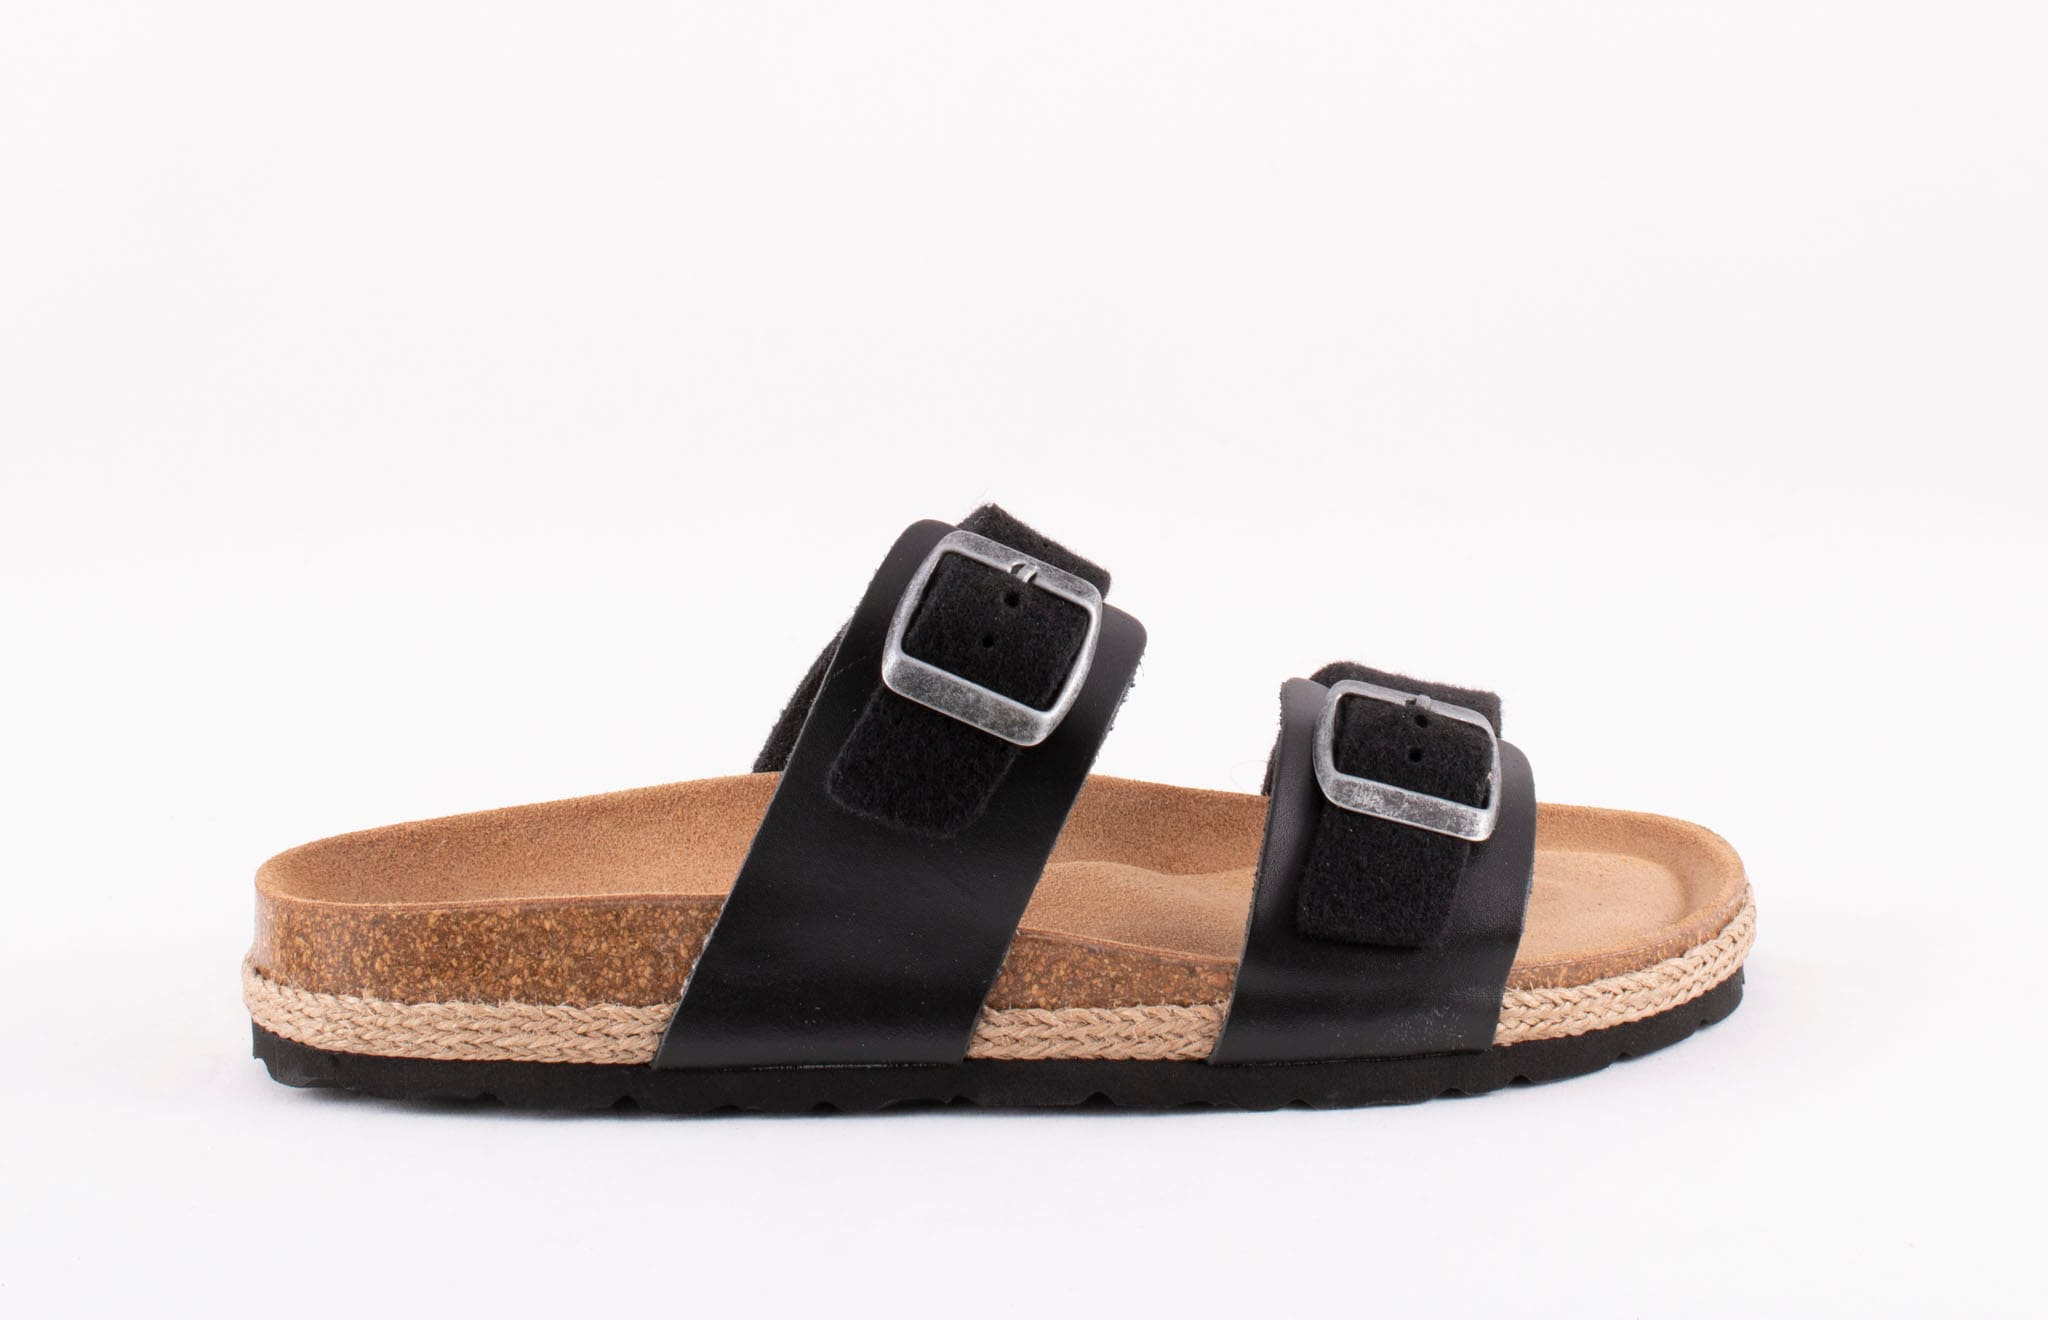 Kicki sandals Black